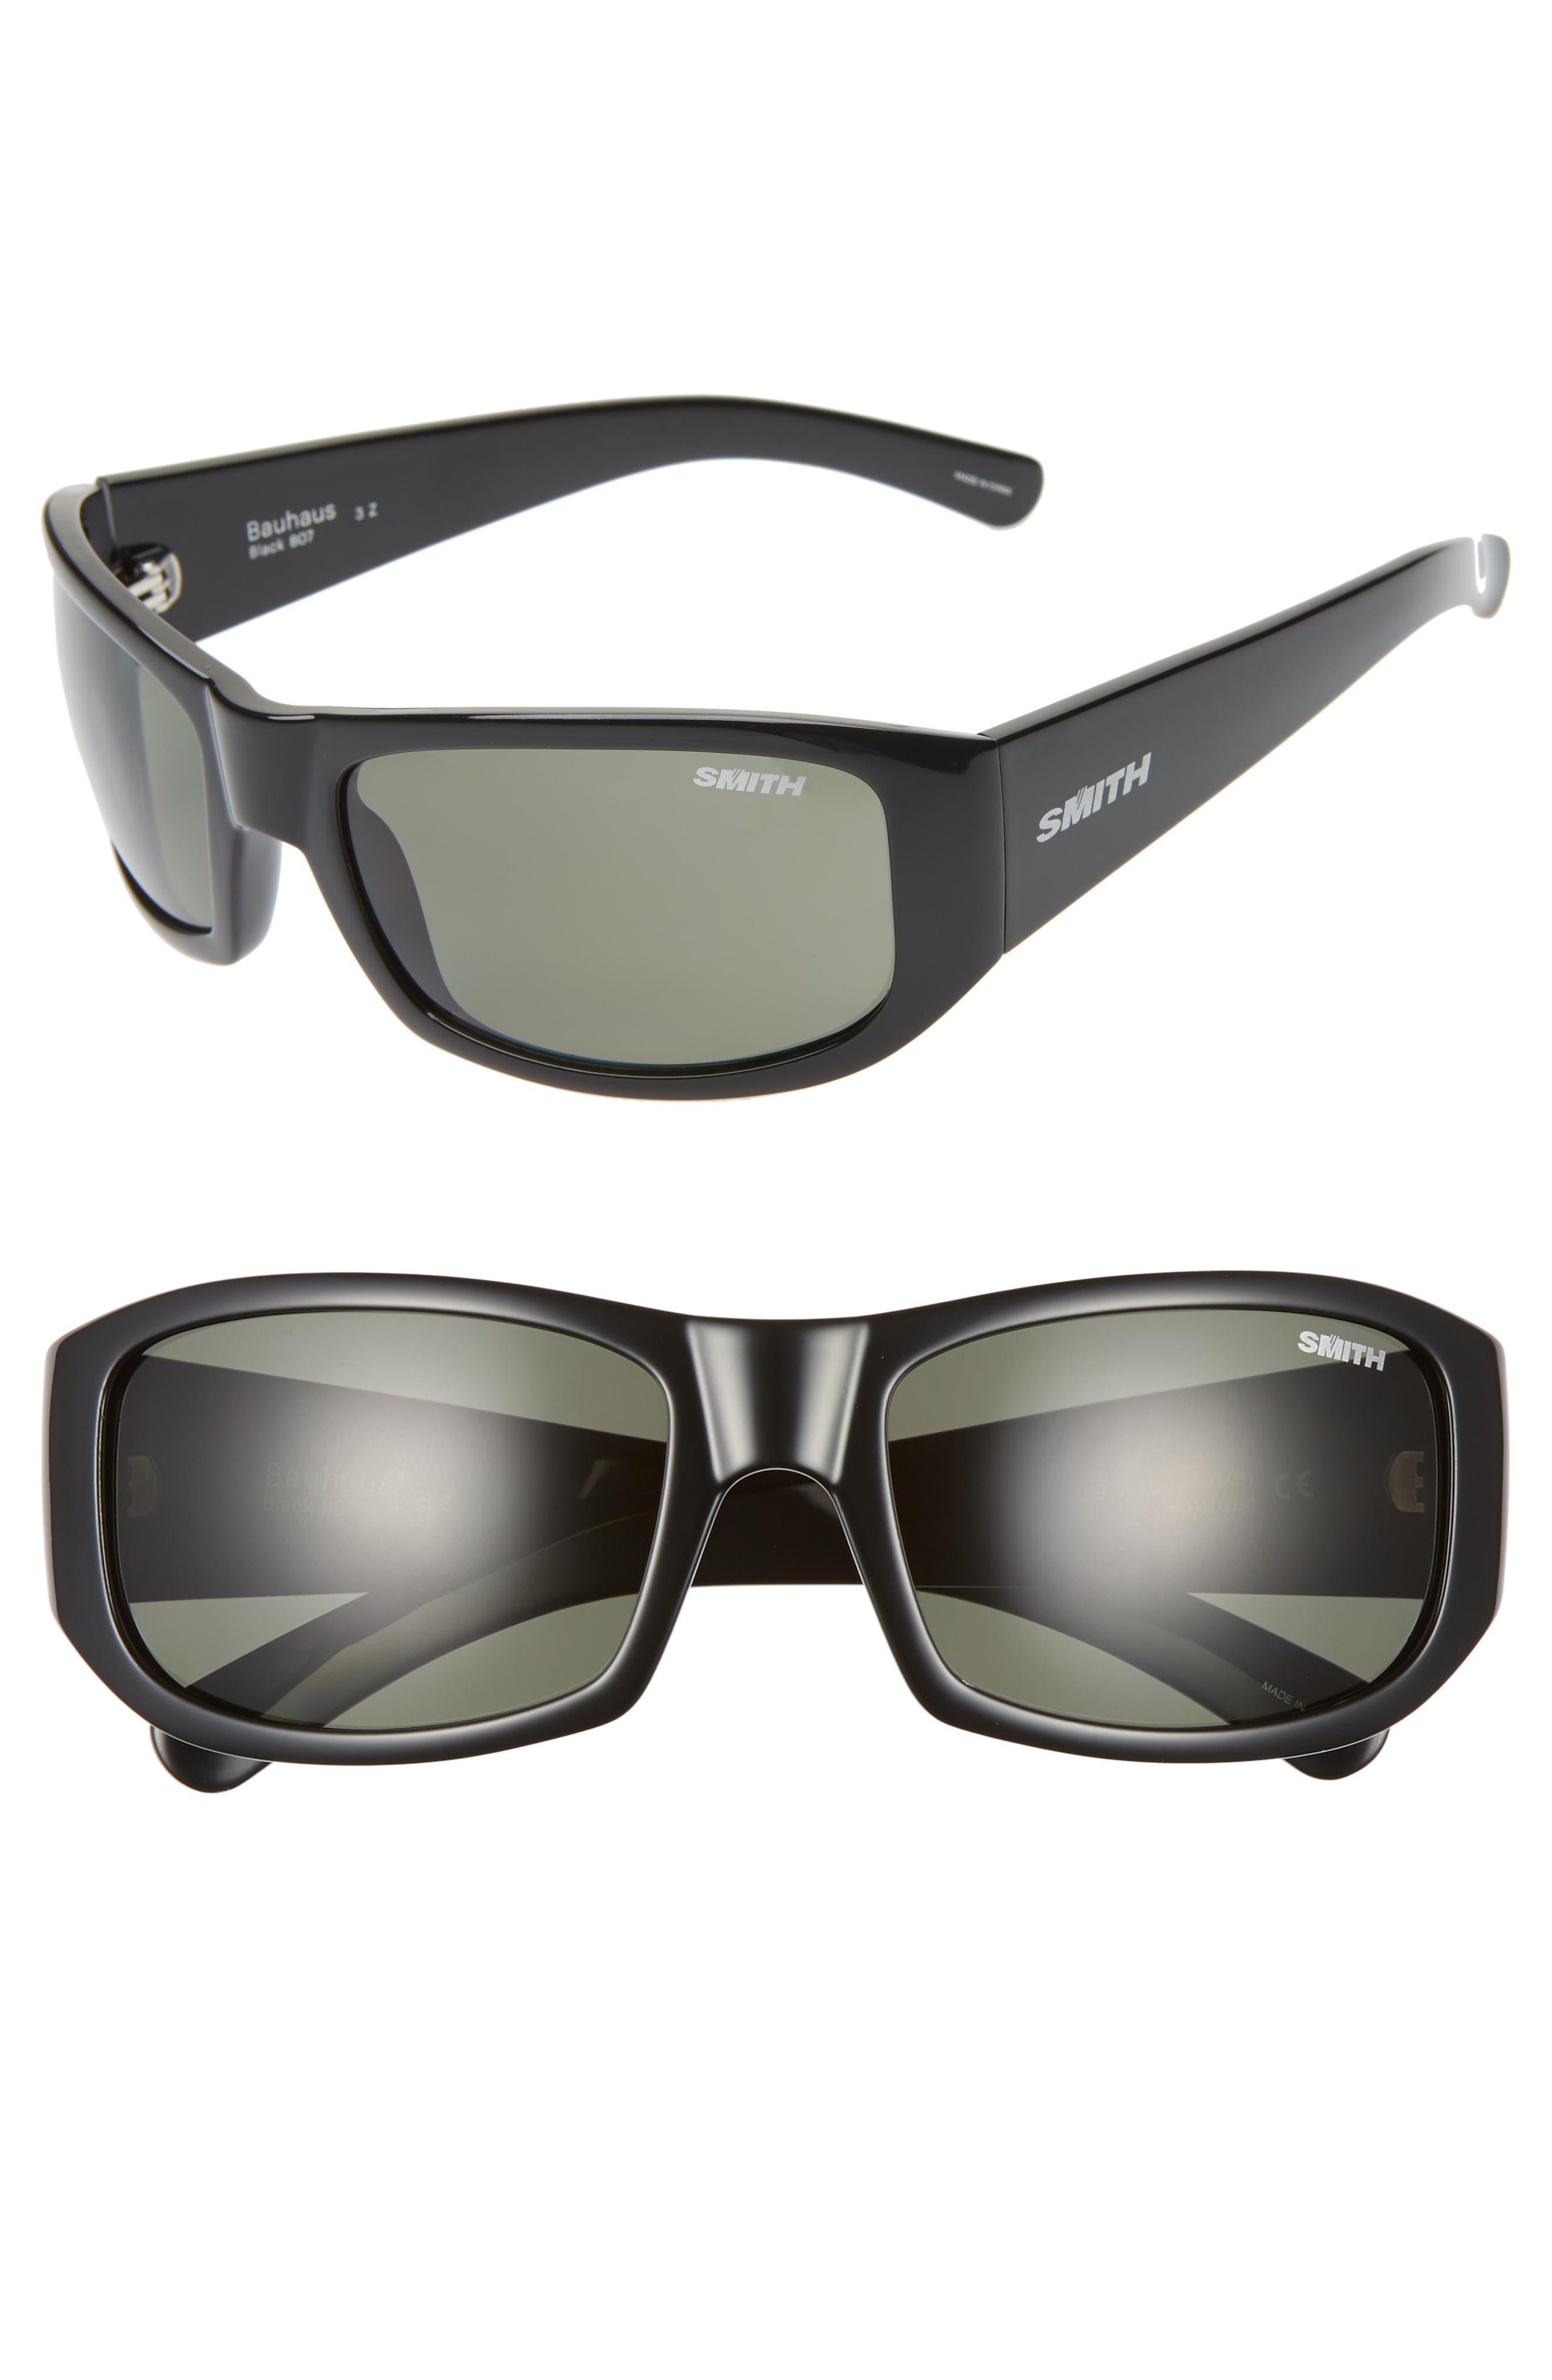 d0b7684de27 Smith Bauhaus 5m Chromapop(TM) Polarized Wraparound Sunglasses - Black